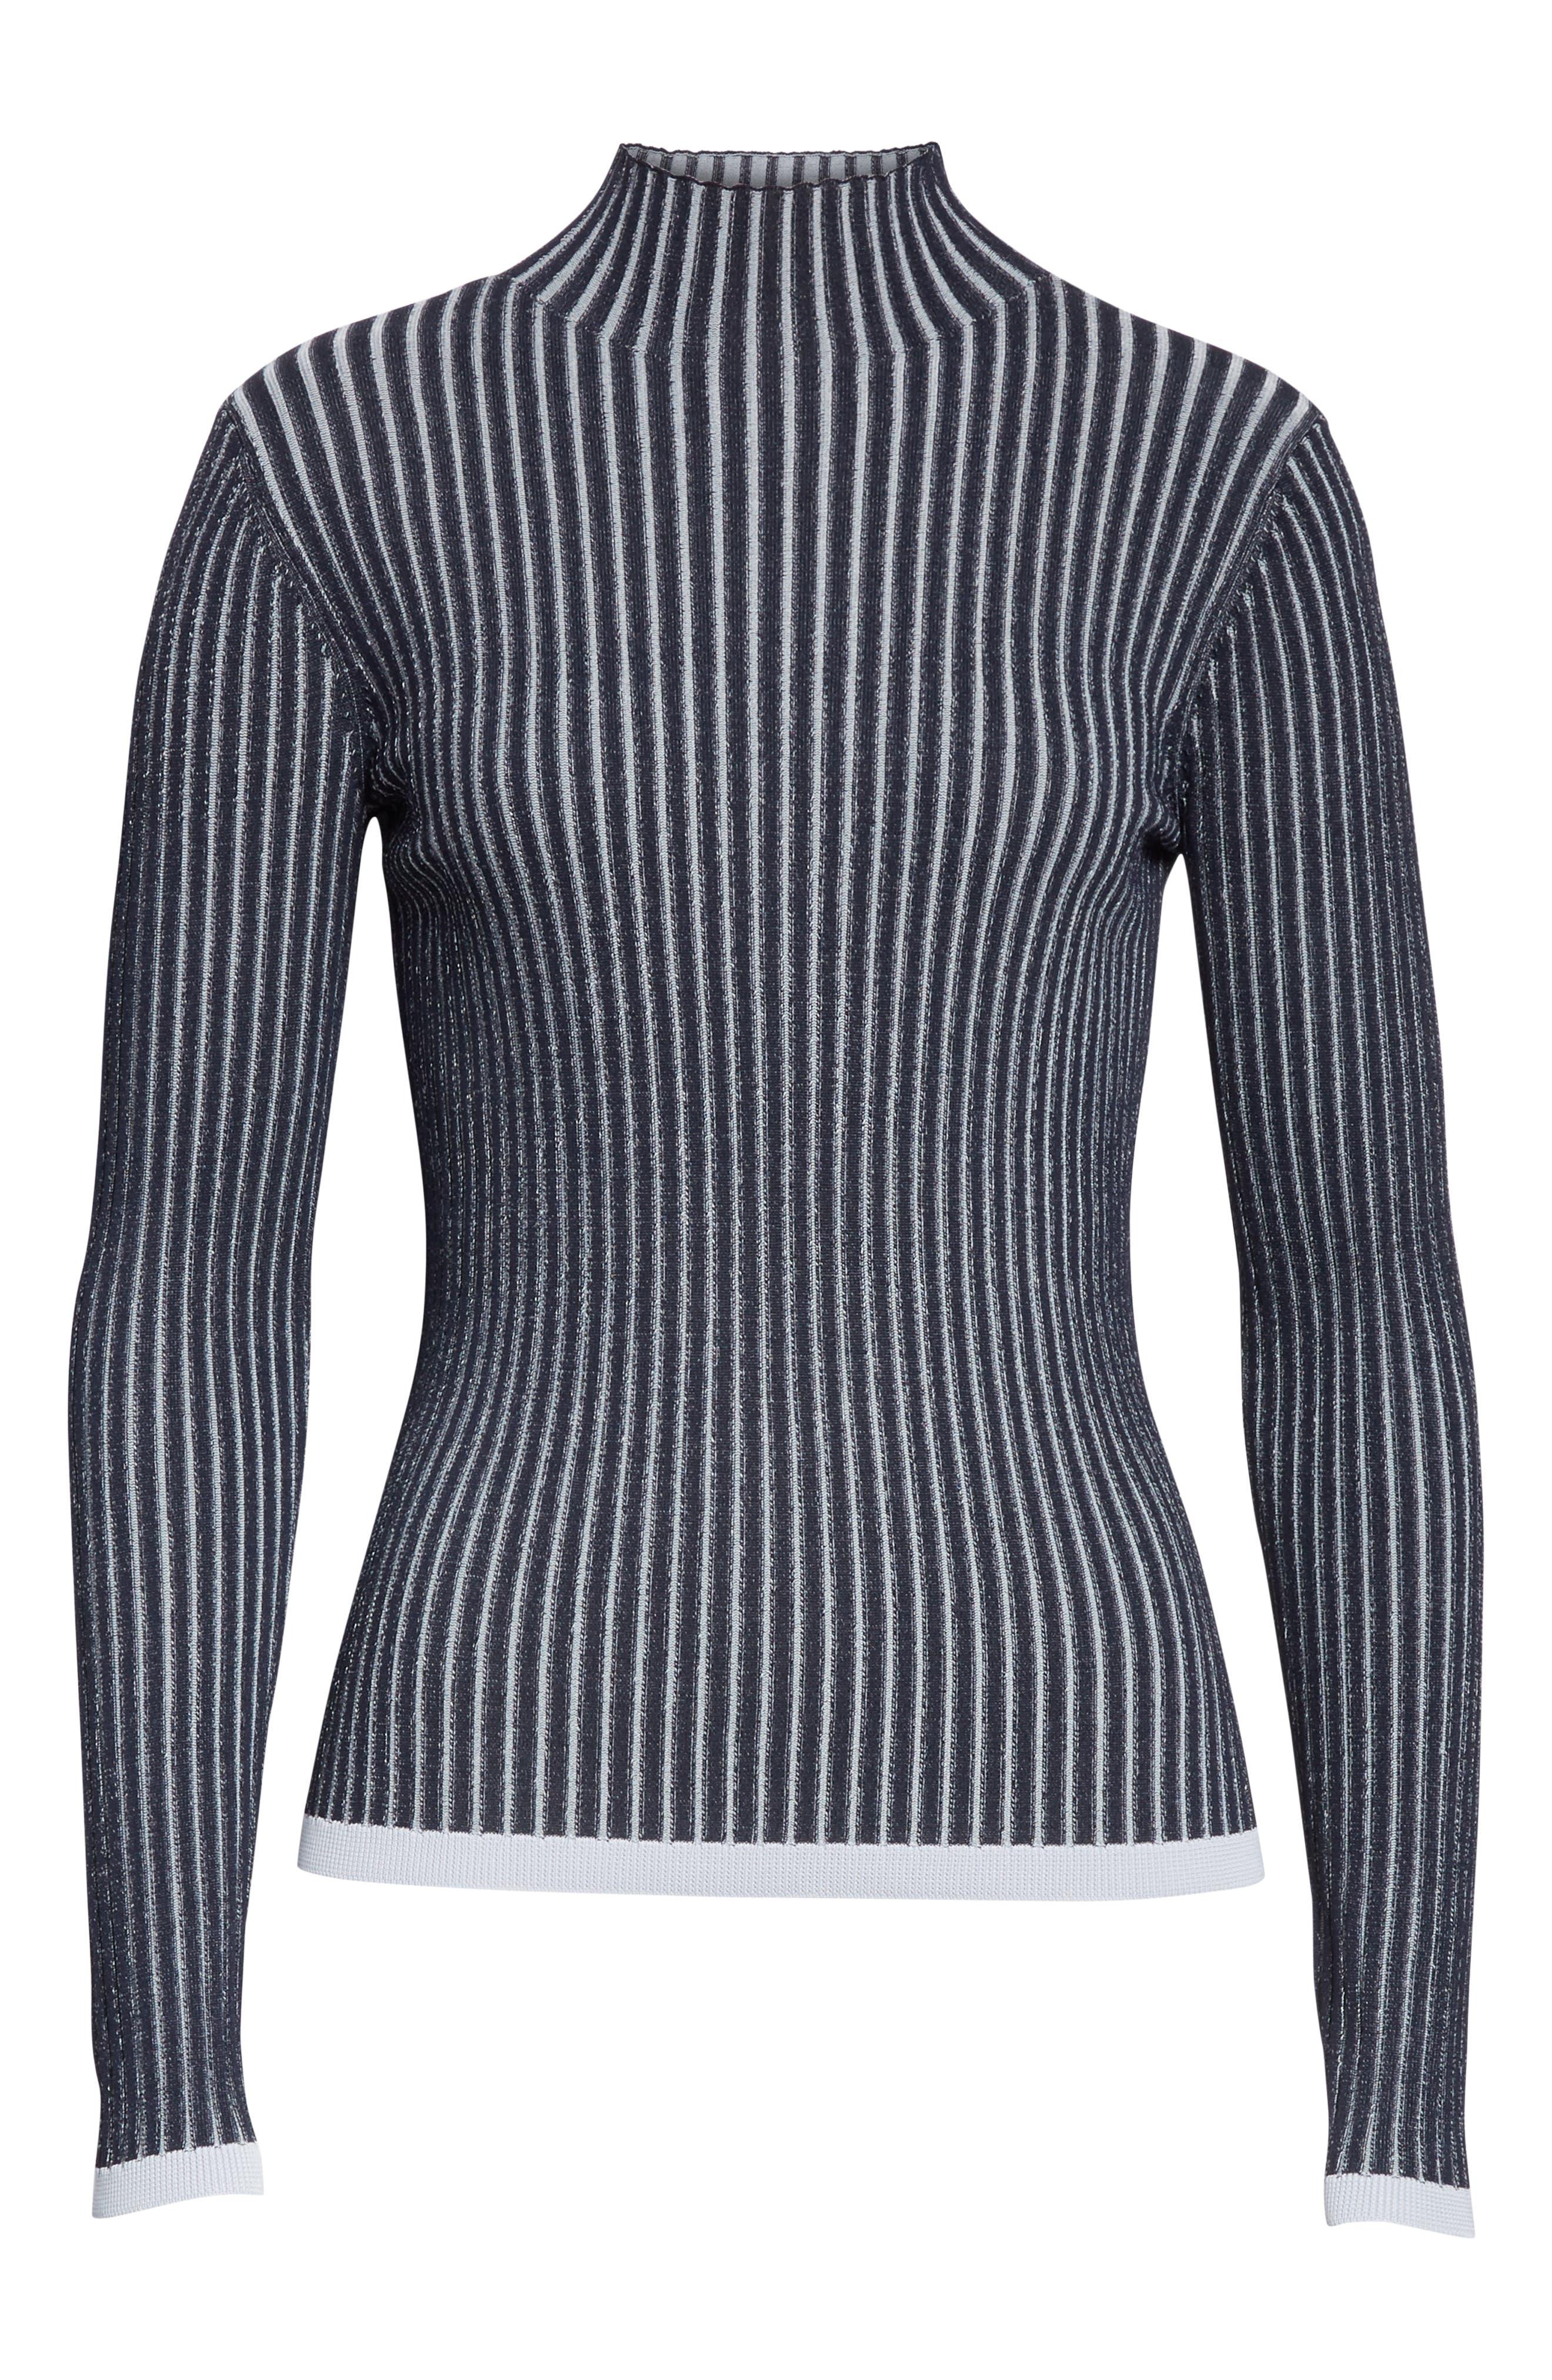 LEWIT, Stripe Ribbed Mock Neck Sweater, Alternate thumbnail 6, color, NAVY ICELANDIC STRIPE